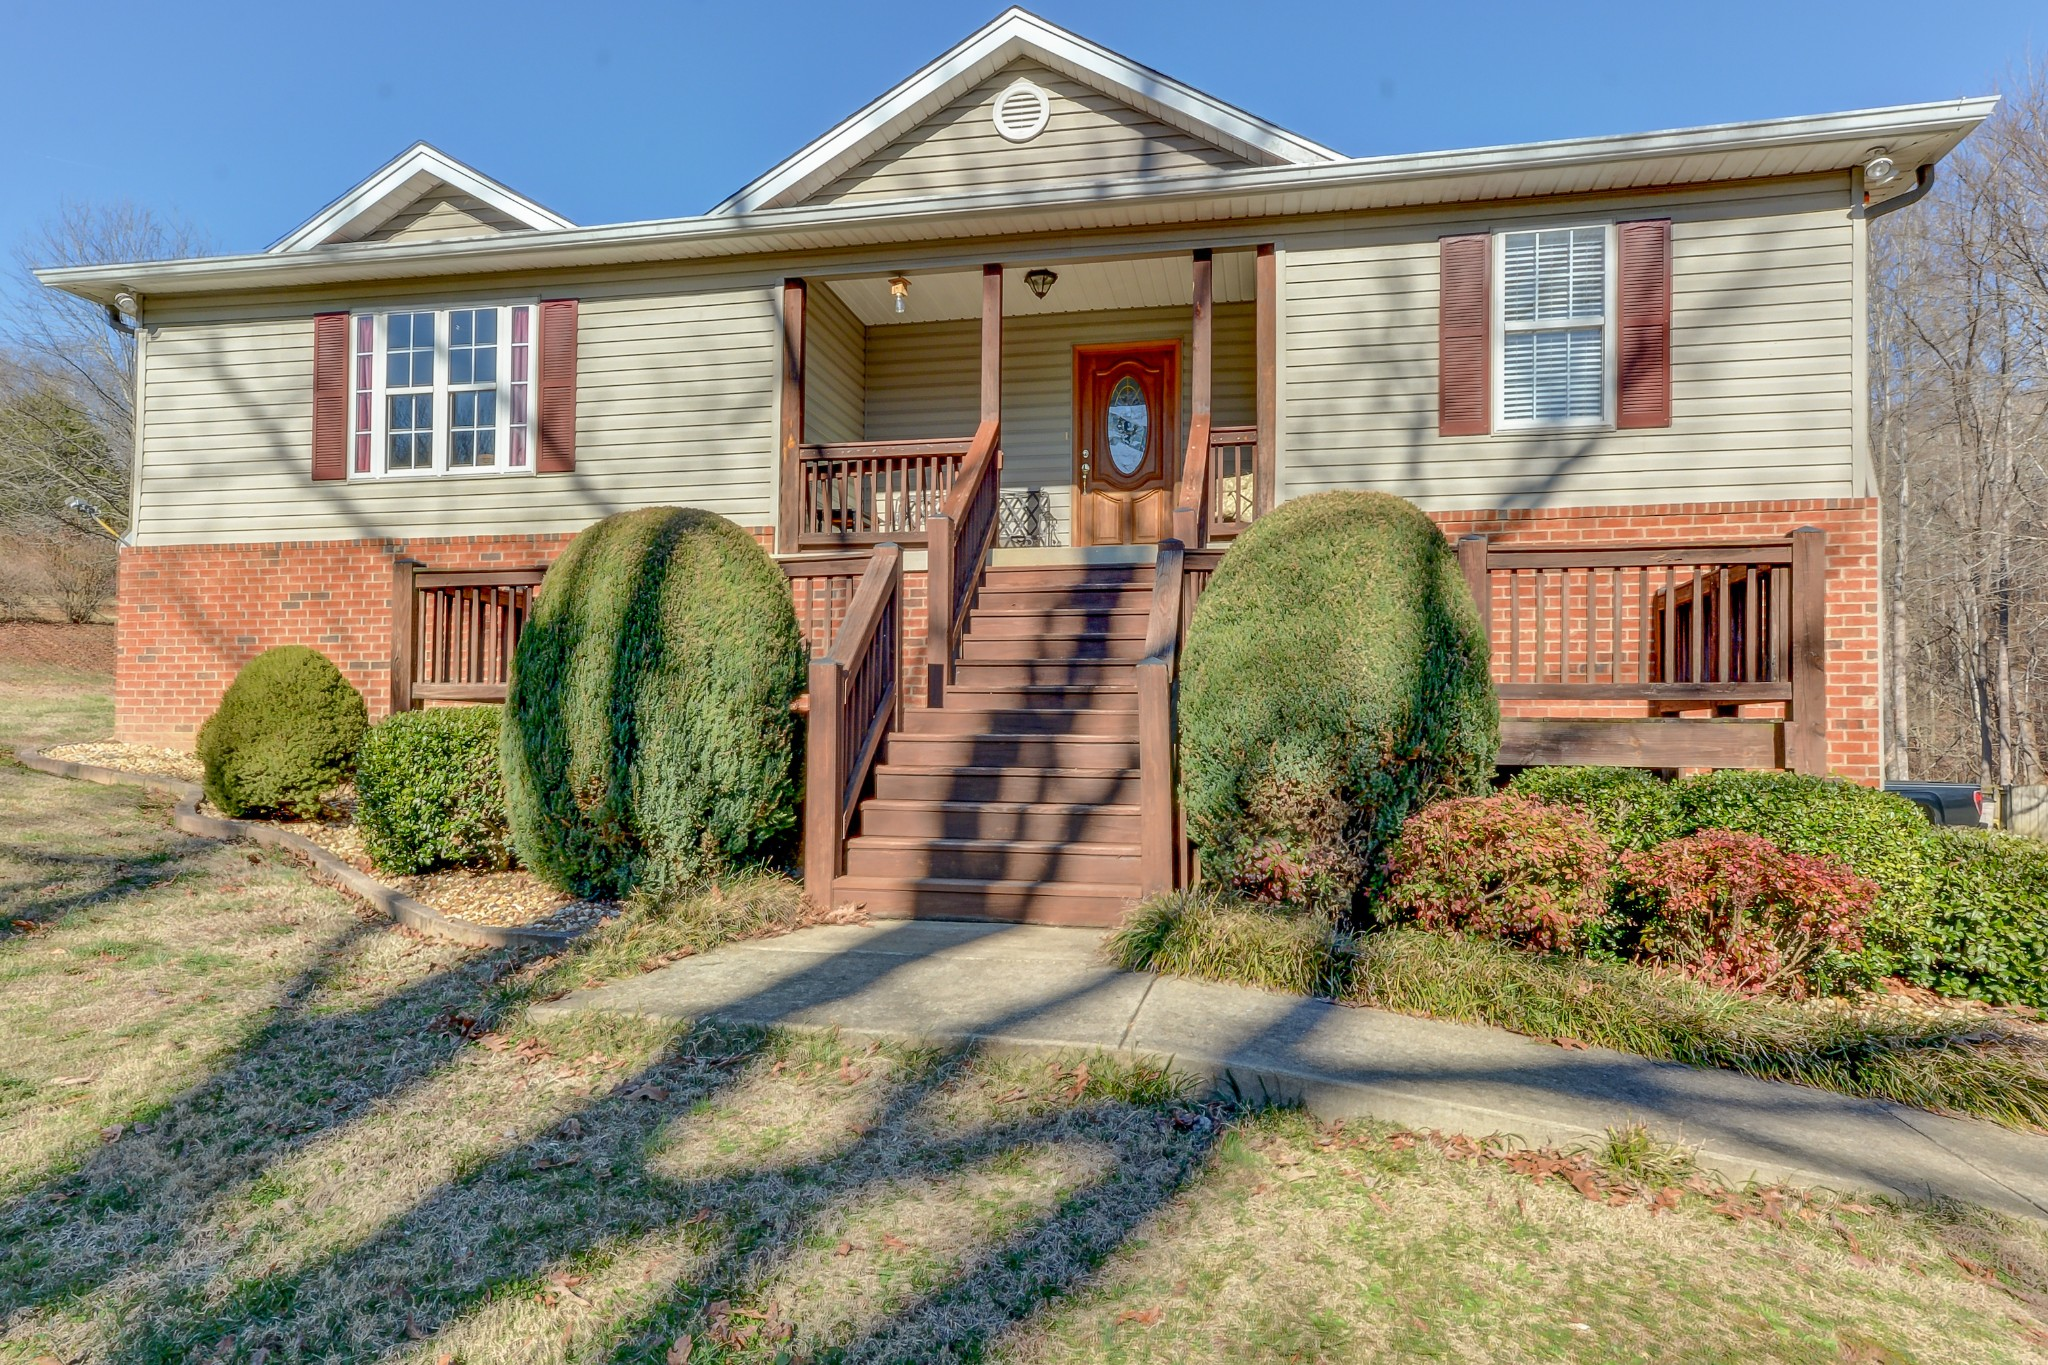 1134 Pee Dee Branch Rd, Cottontown, TN 37048 - Cottontown, TN real estate listing